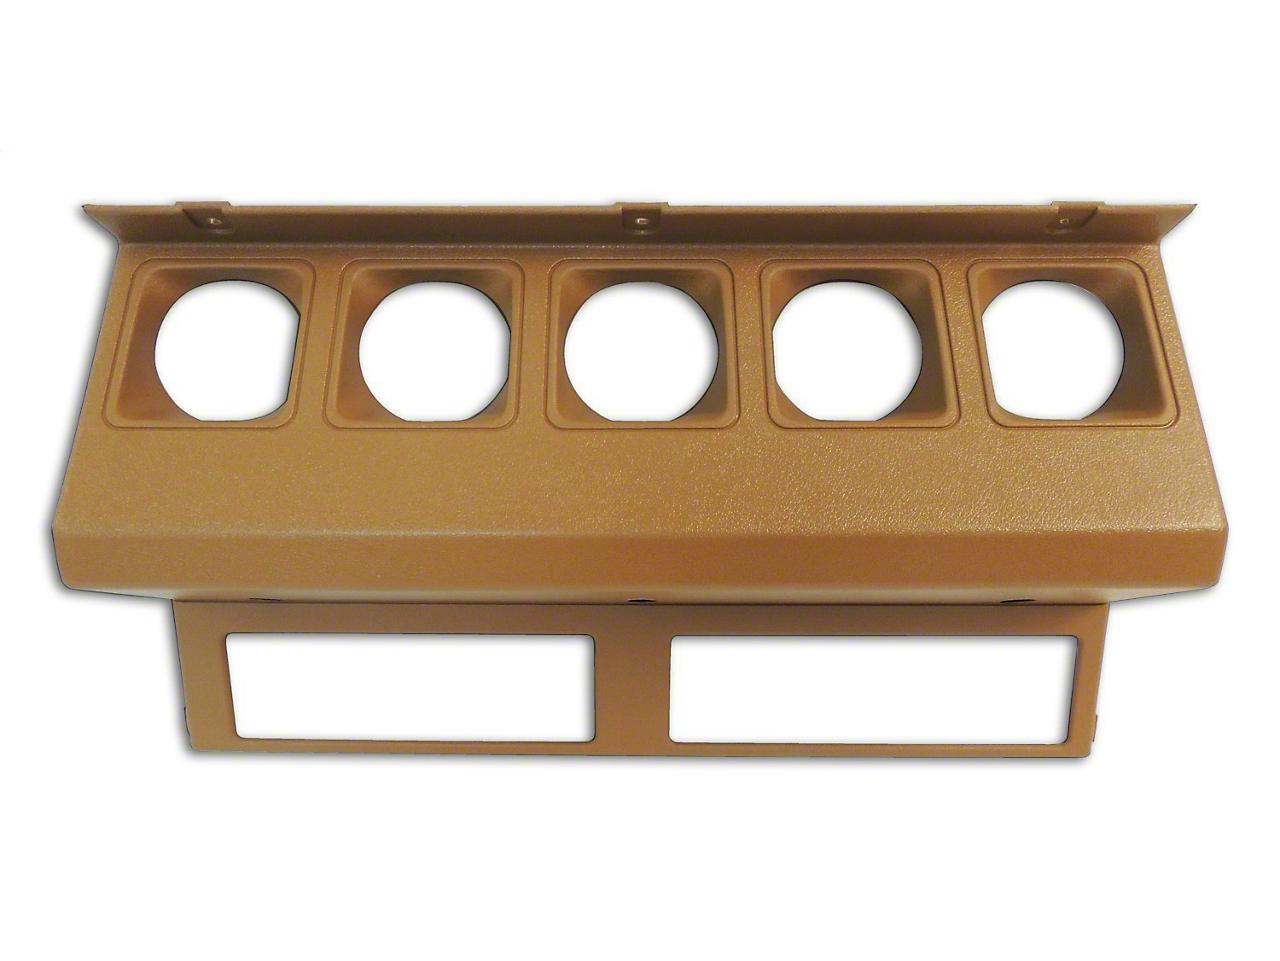 Crown Automotive Instrument Panel Housing - Spice (91-95 Wrangler YJ)